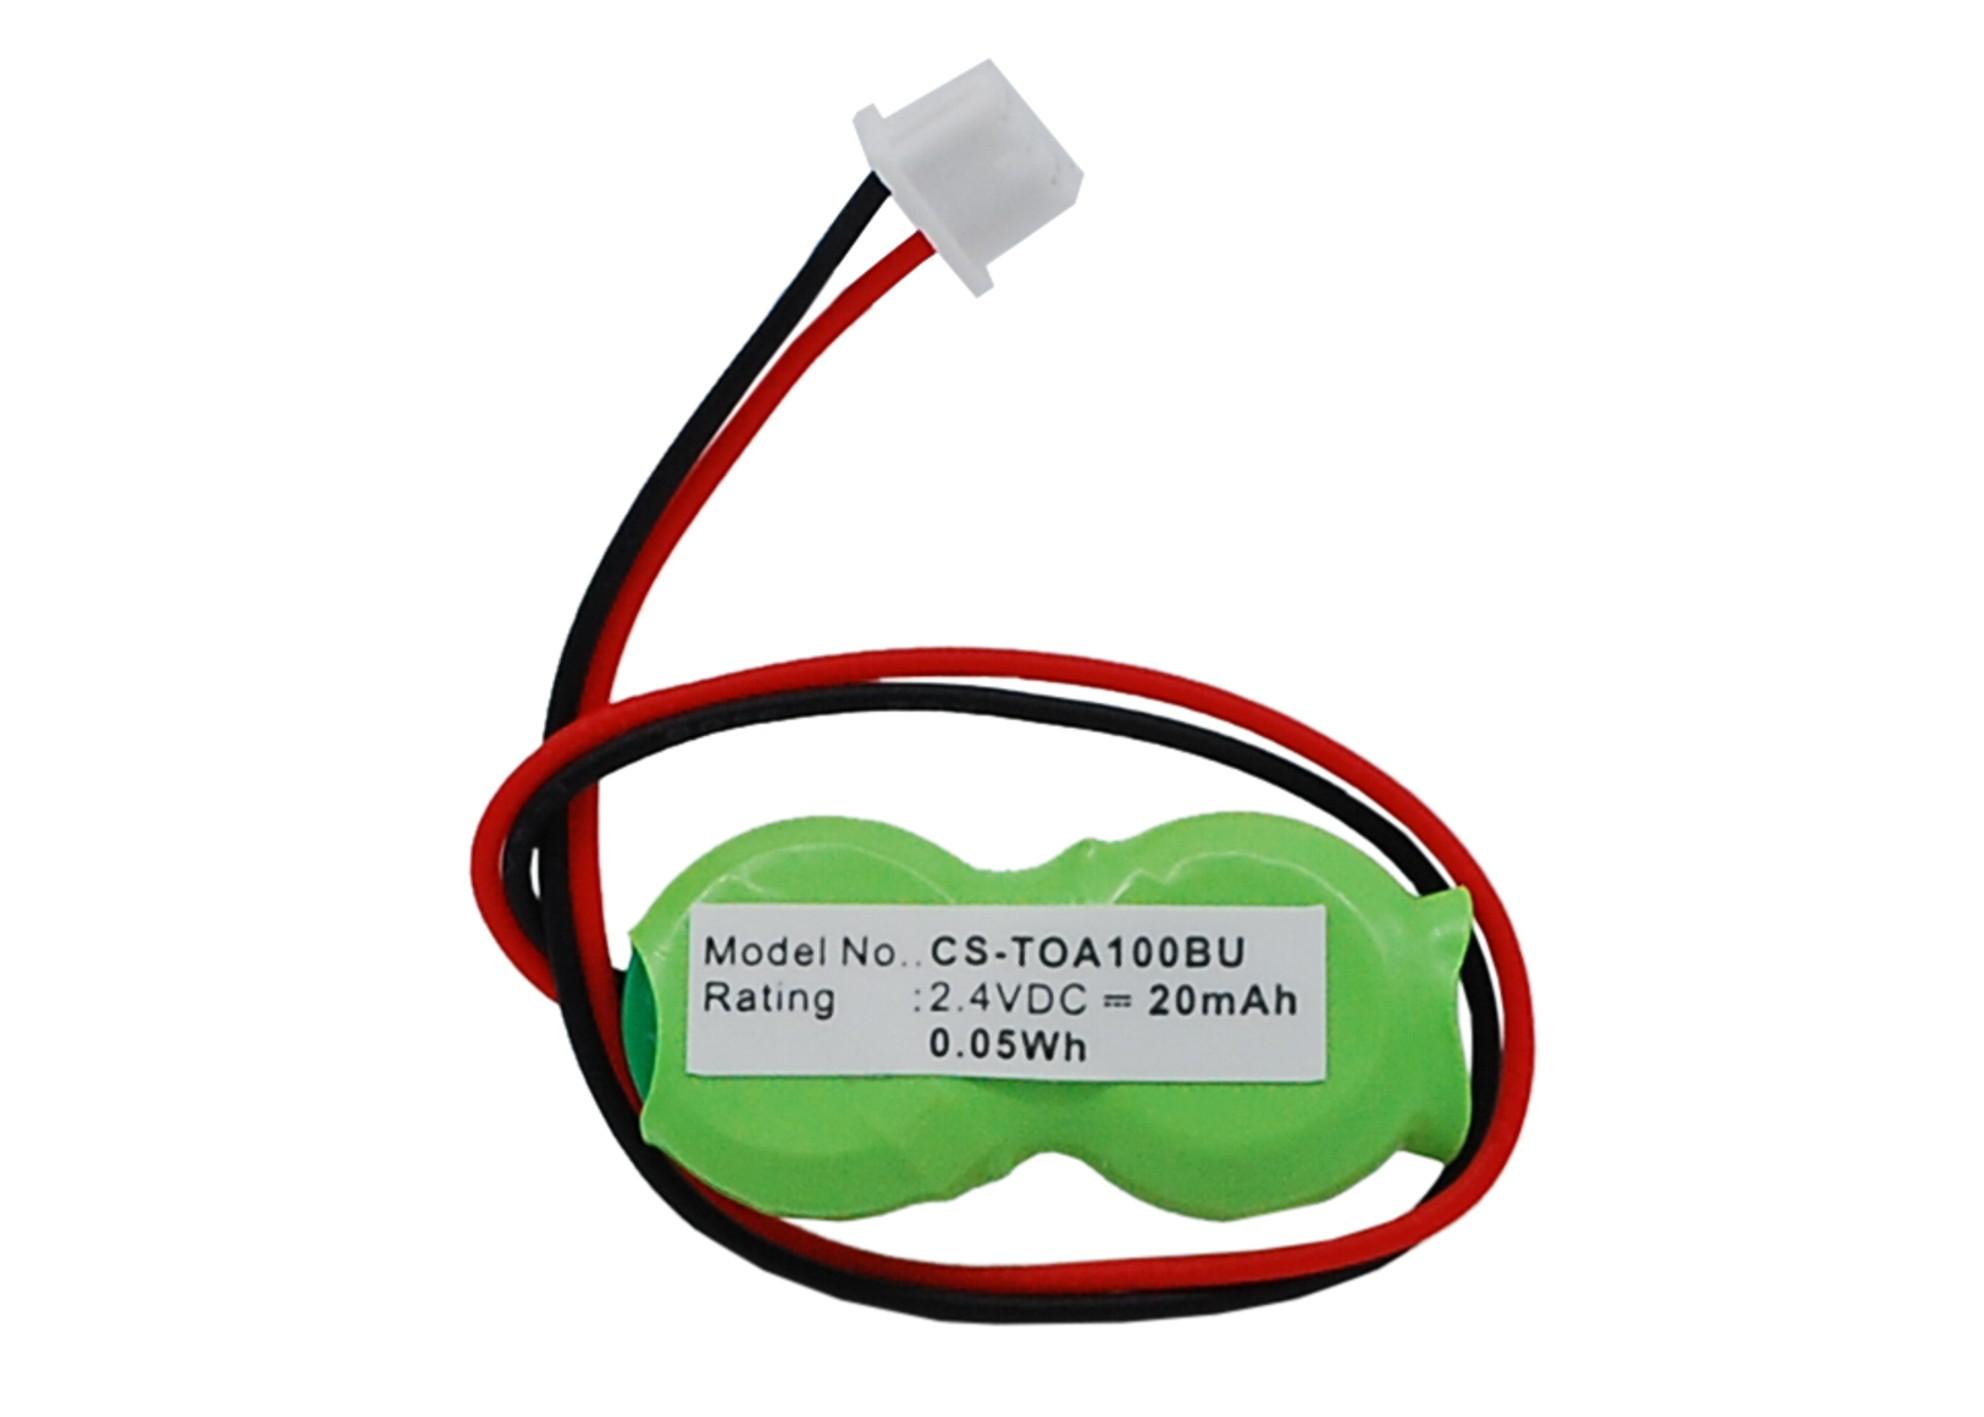 Cameron Sino baterie cmos pro TOSHIBA Portege R600-SP2801A 2.4V Ni-MH 20mAh zelená - neoriginální